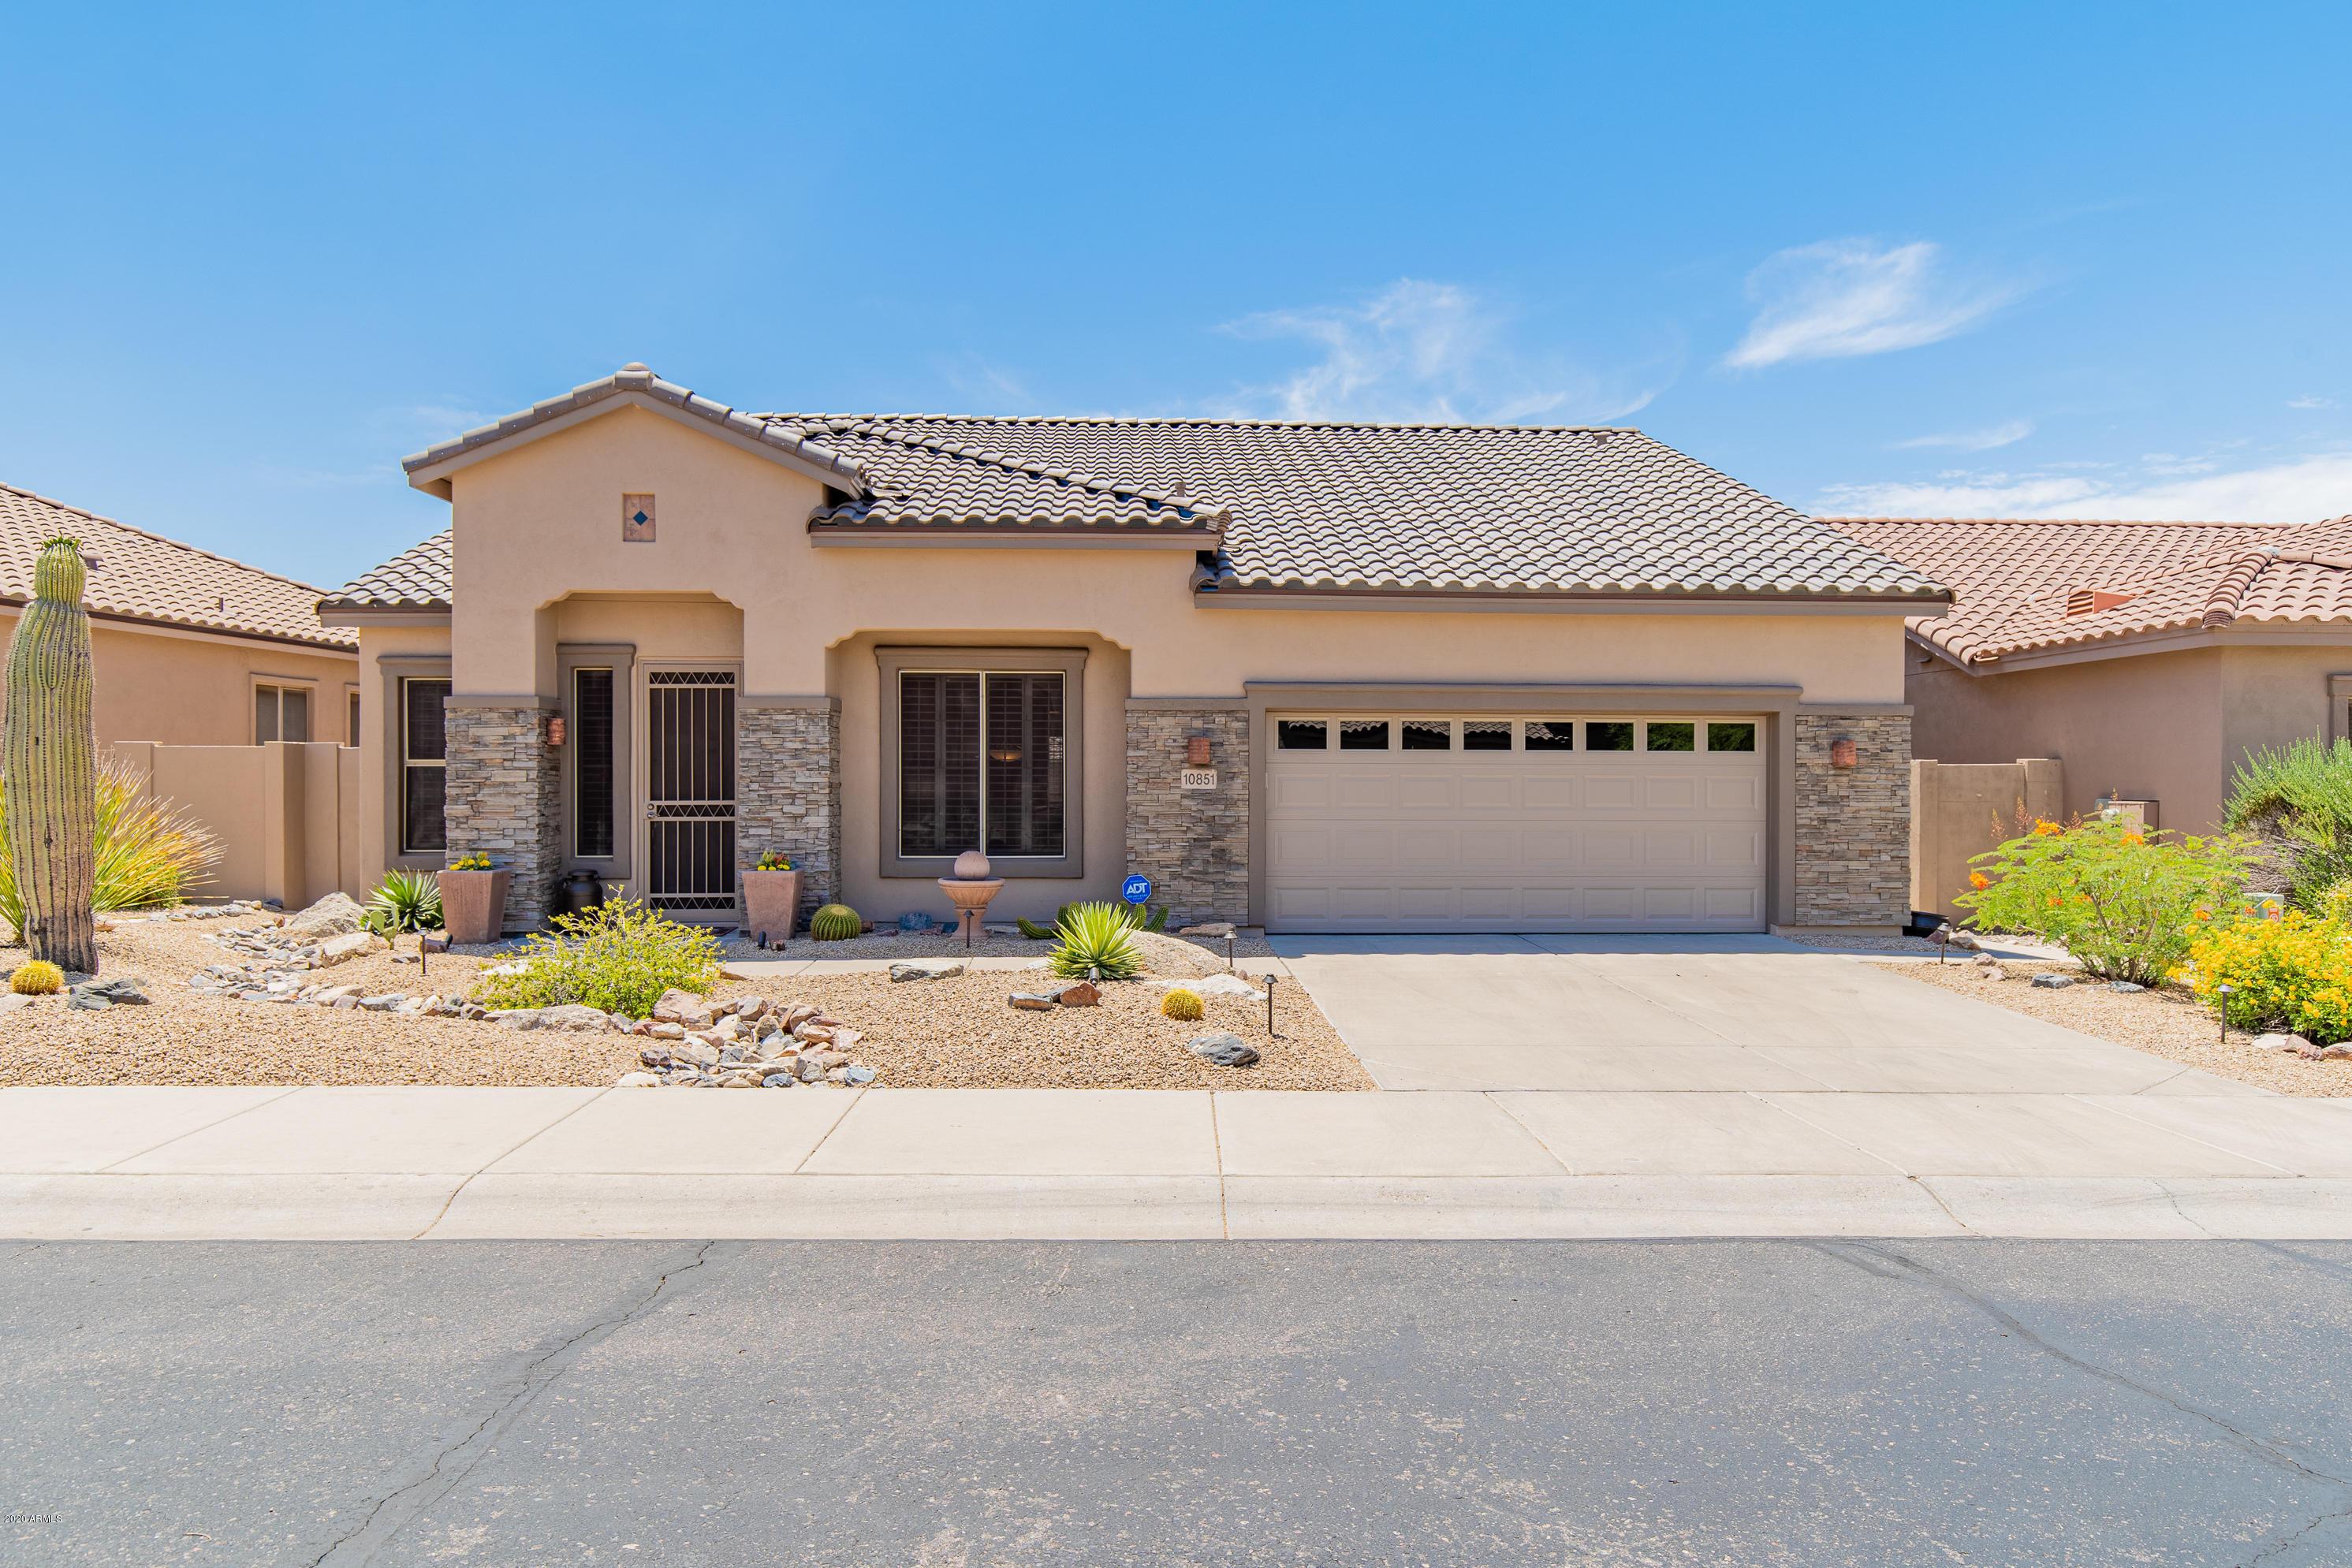 Photo of 10851 E Le Marche Drive, Scottsdale, AZ 85255